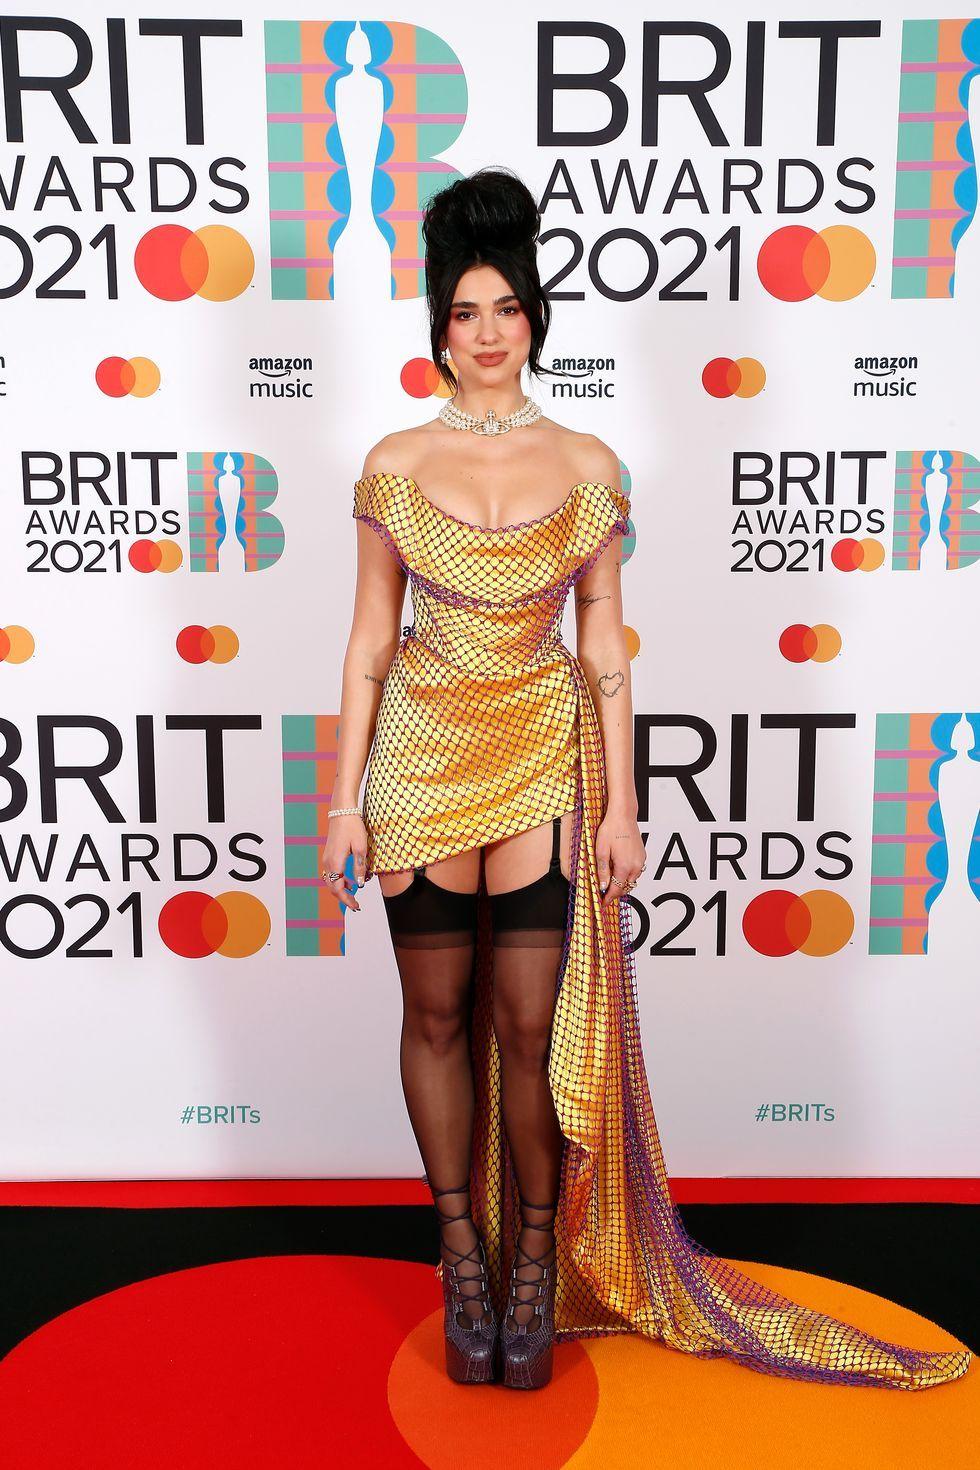 10 Gaya Terbaik diBRIT Awards 2021